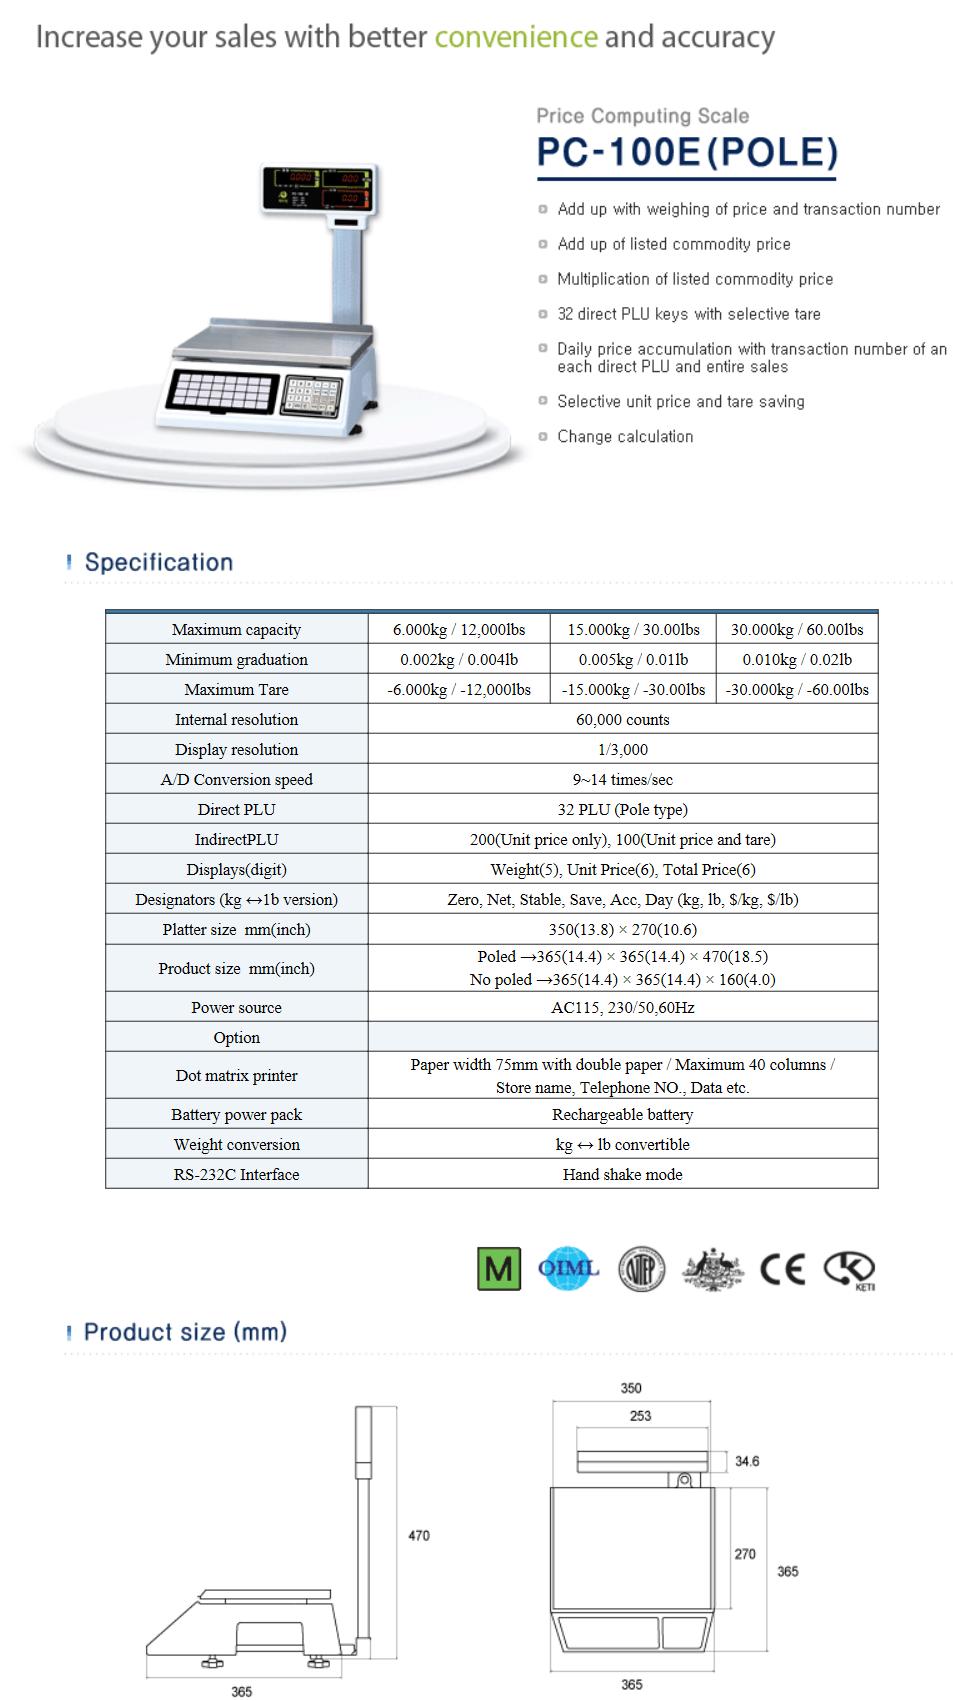 ACOM Price Computing Scale PC-100E